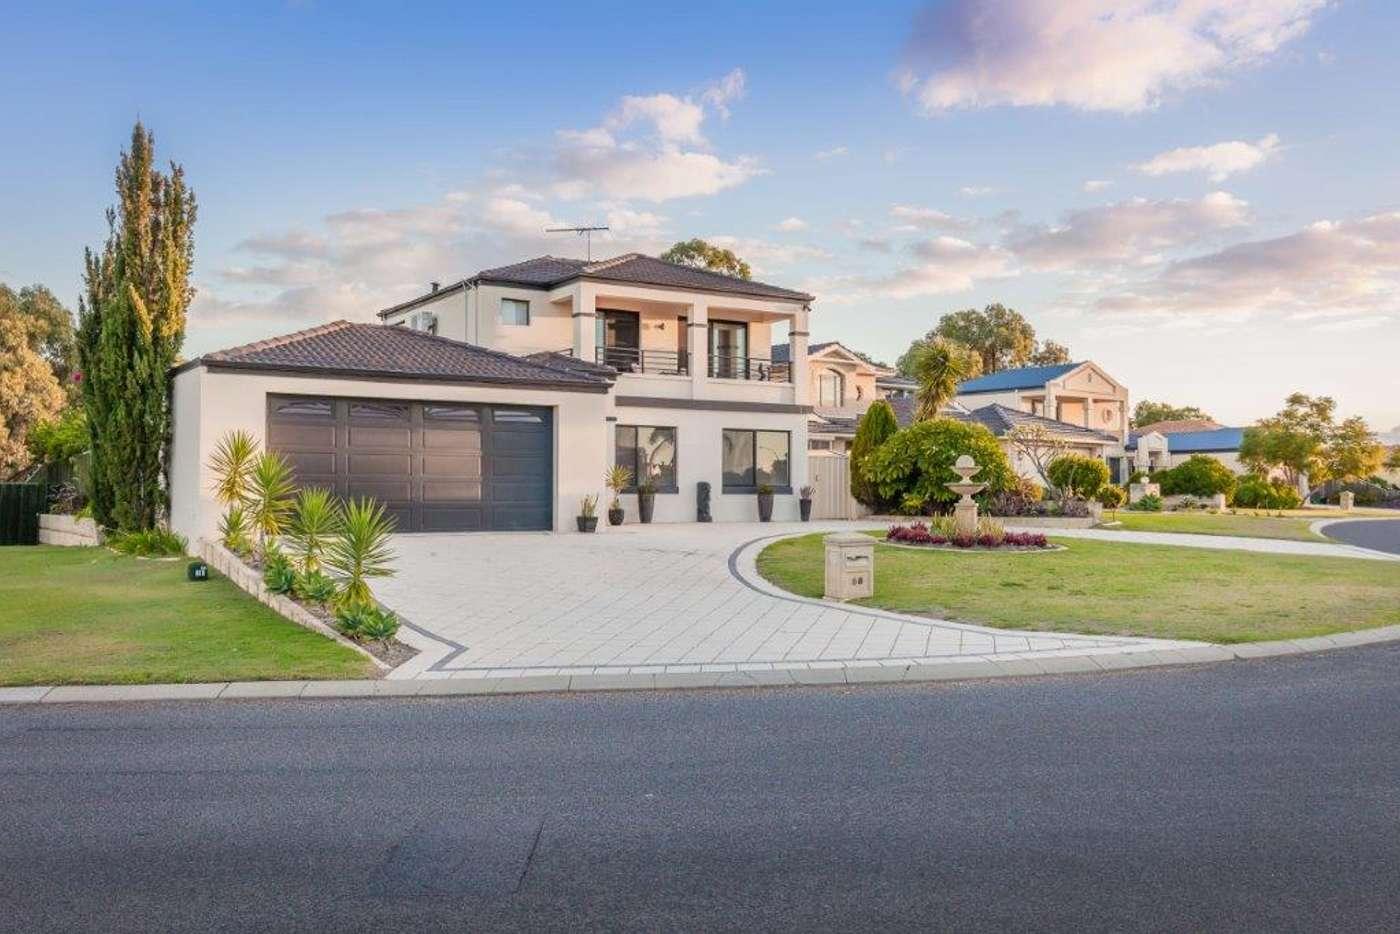 Main view of Homely house listing, 68 La Grange Loop, Currambine WA 6028